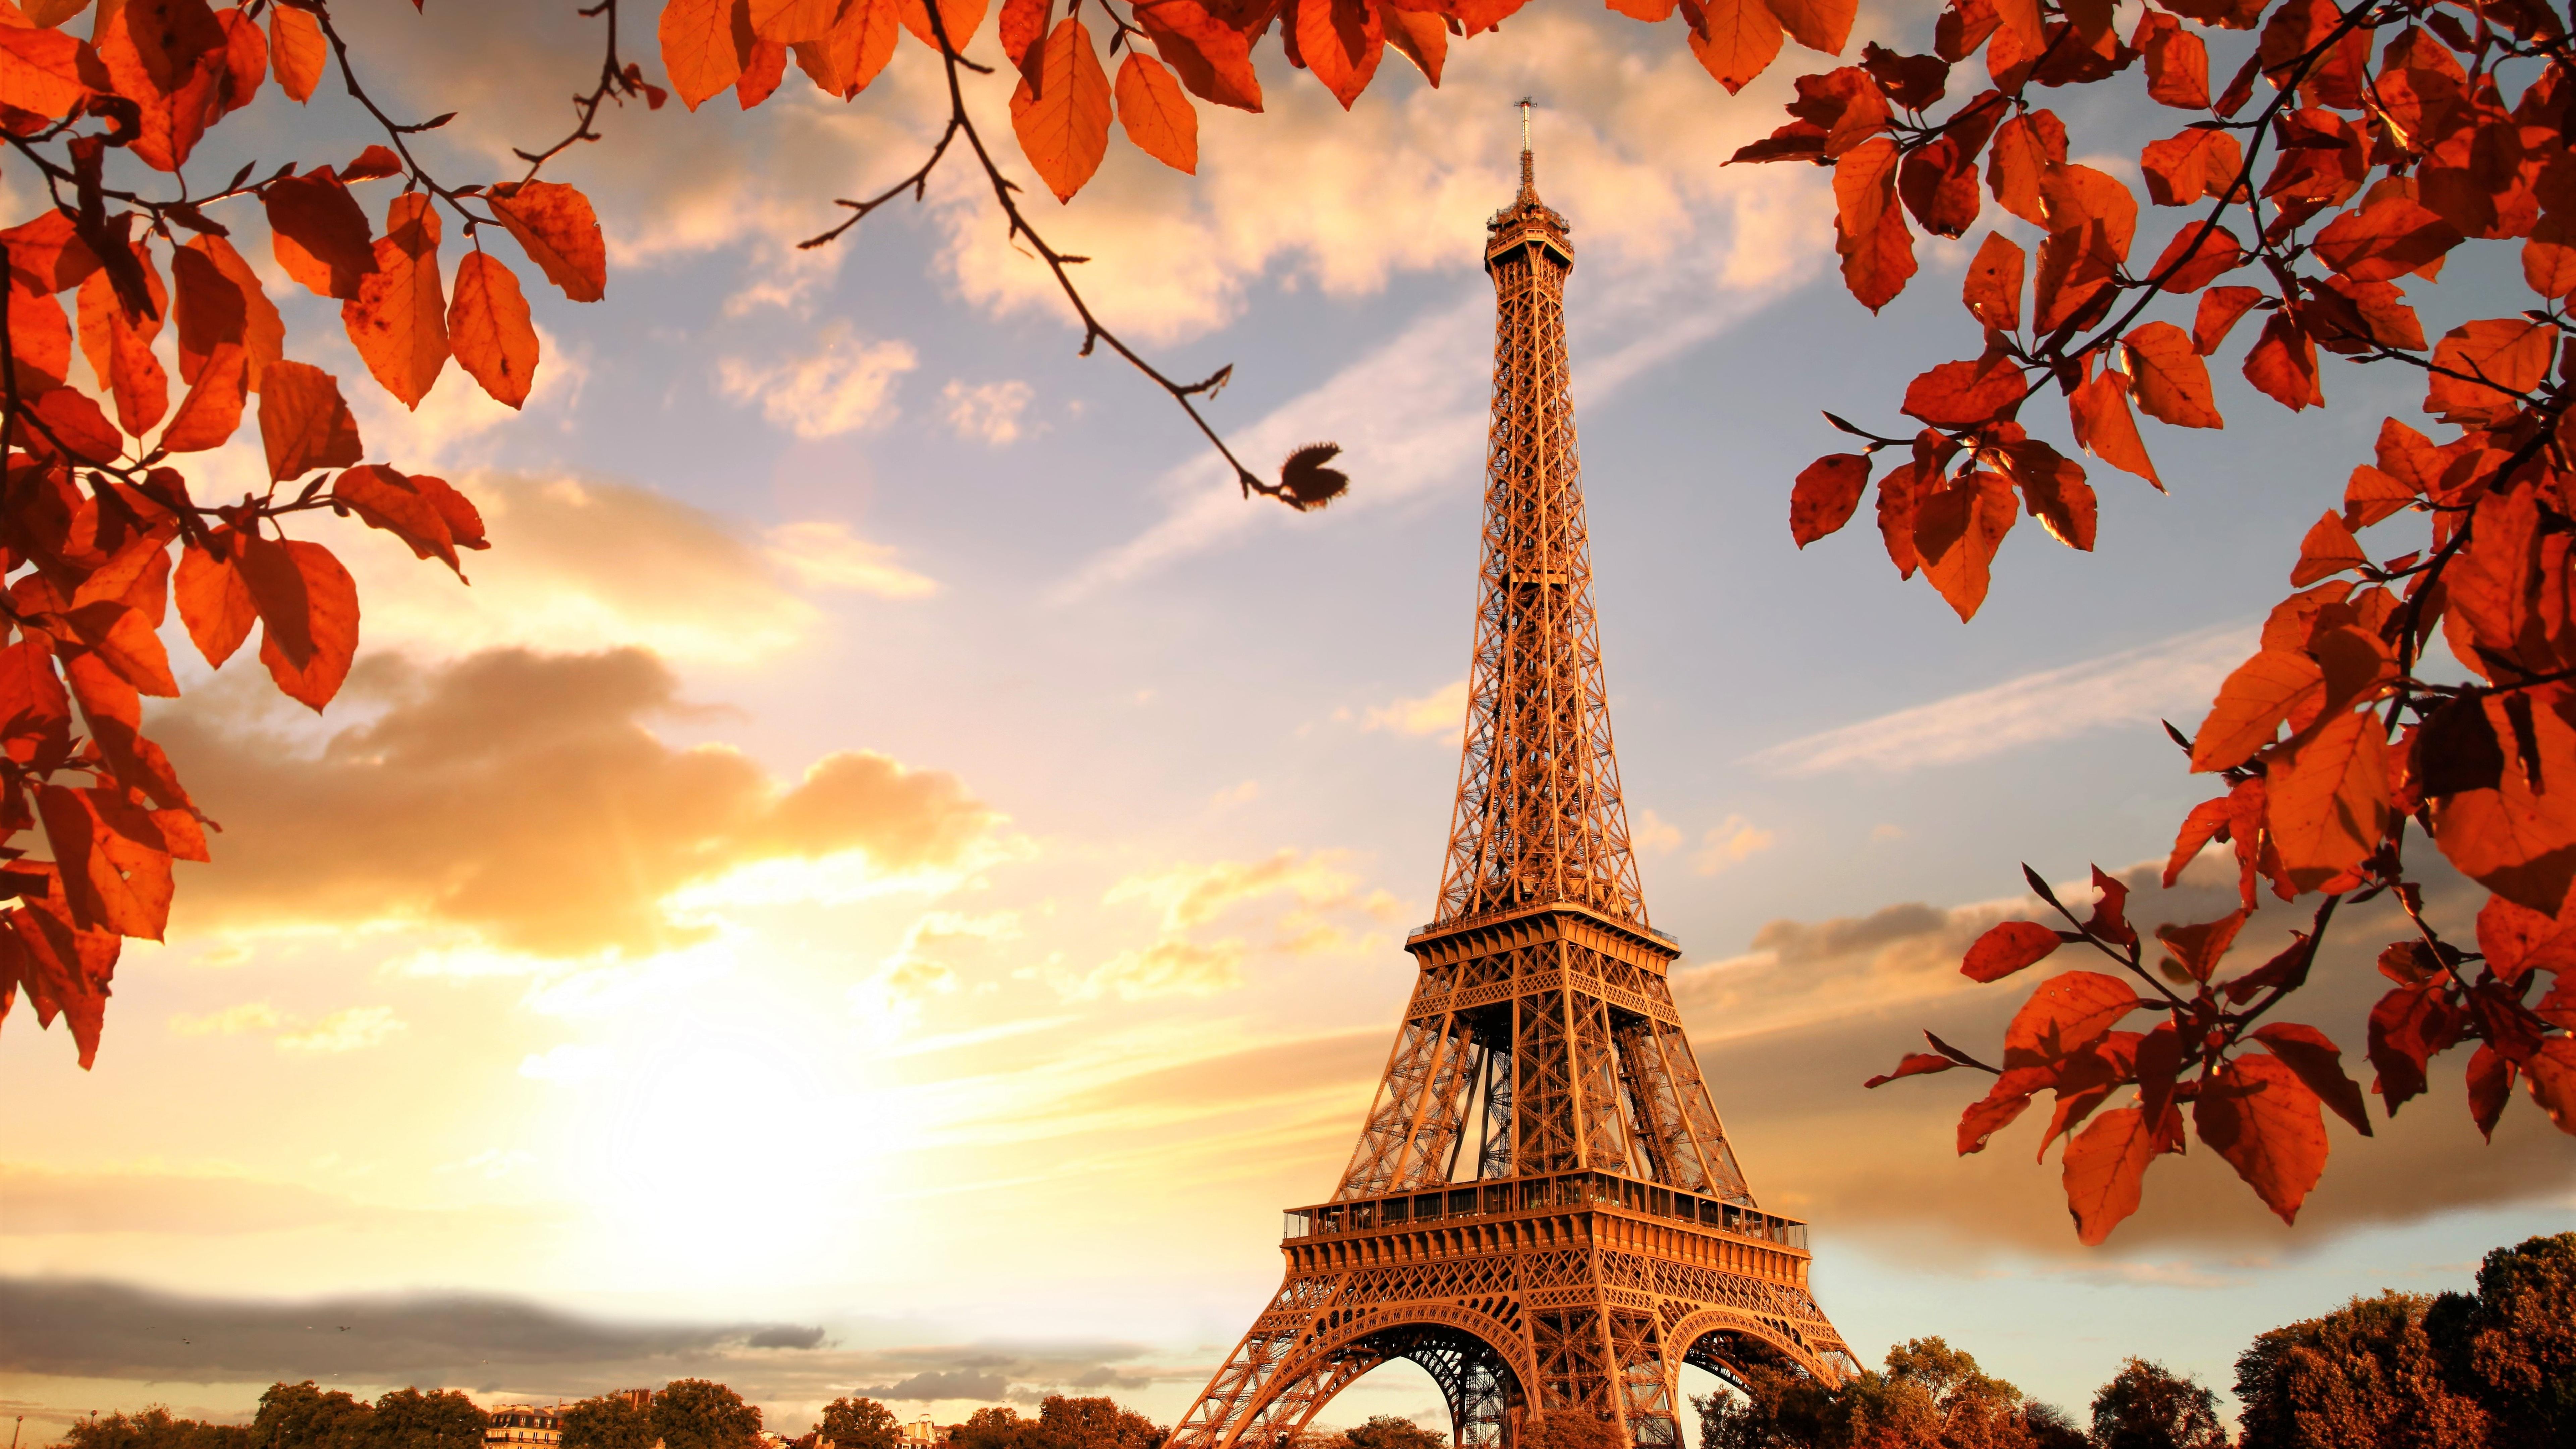 Eiffel Tower In Autumn France Paris Fall Hd 4k Wallpaper